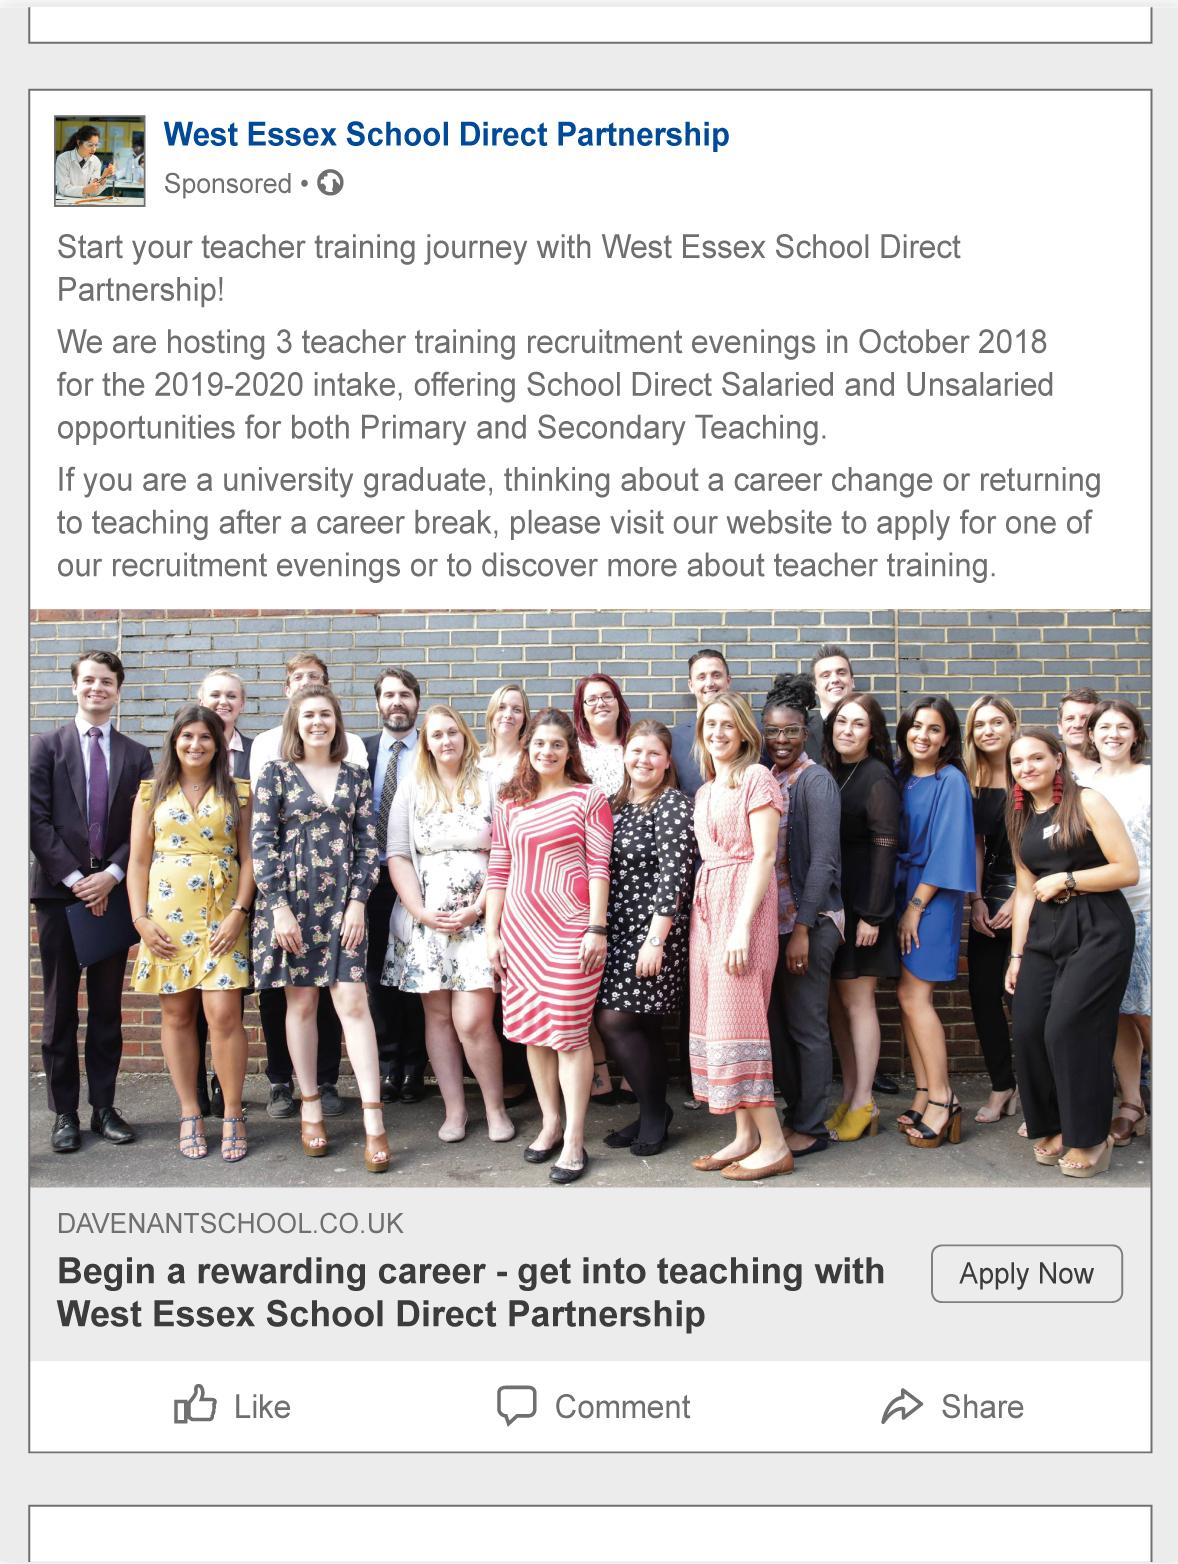 West Essex School Direct Partnership - WSA - The